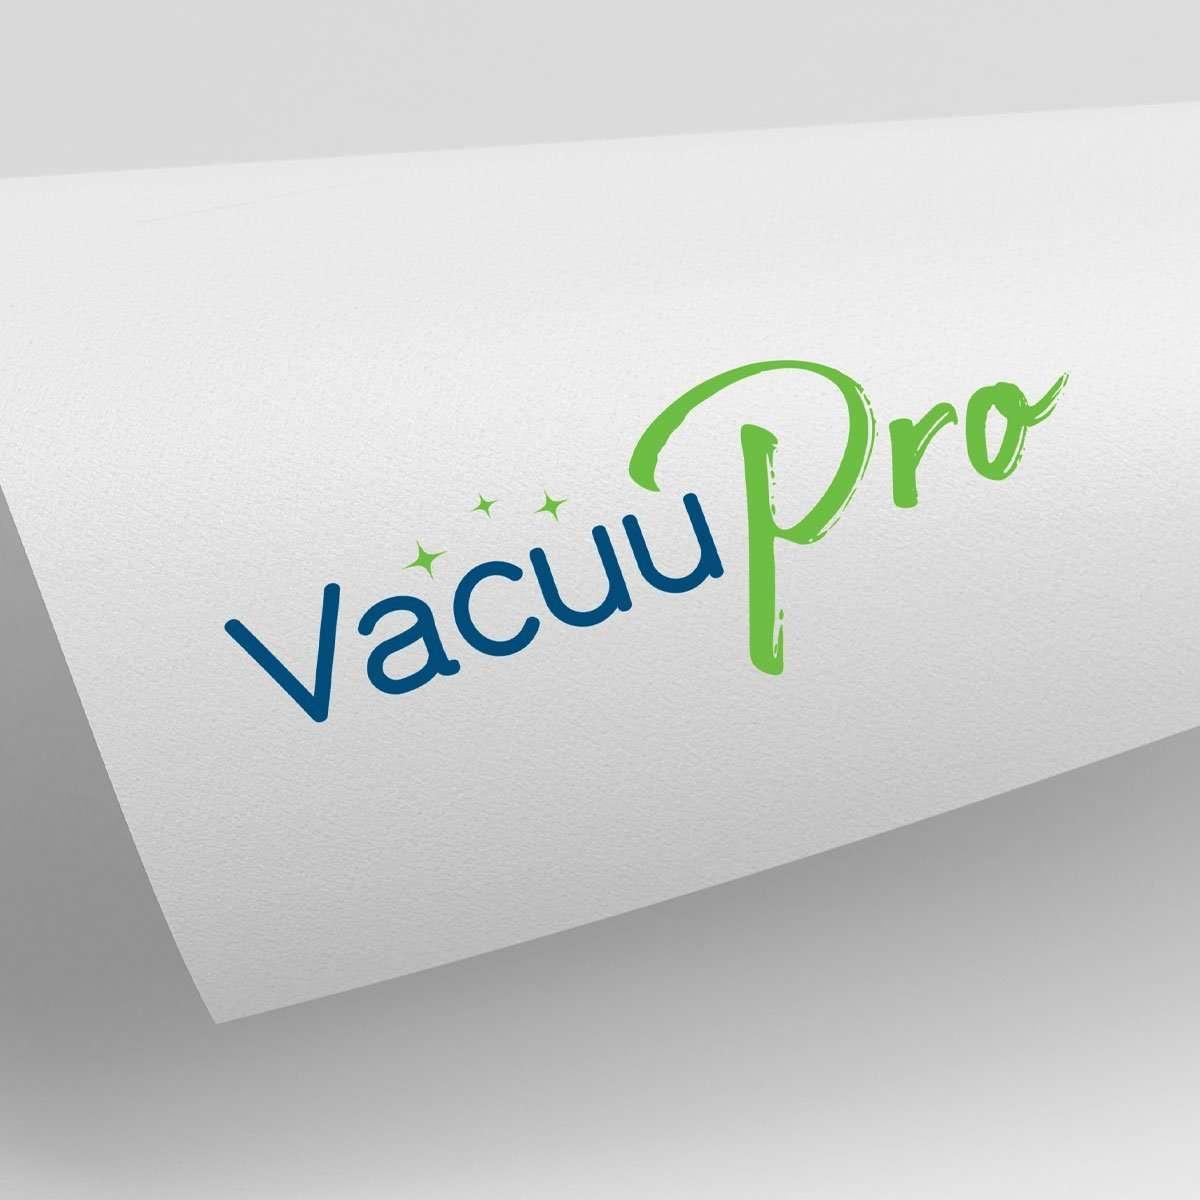 Vacuupro Logo Design by BrandSwan, a logo design company